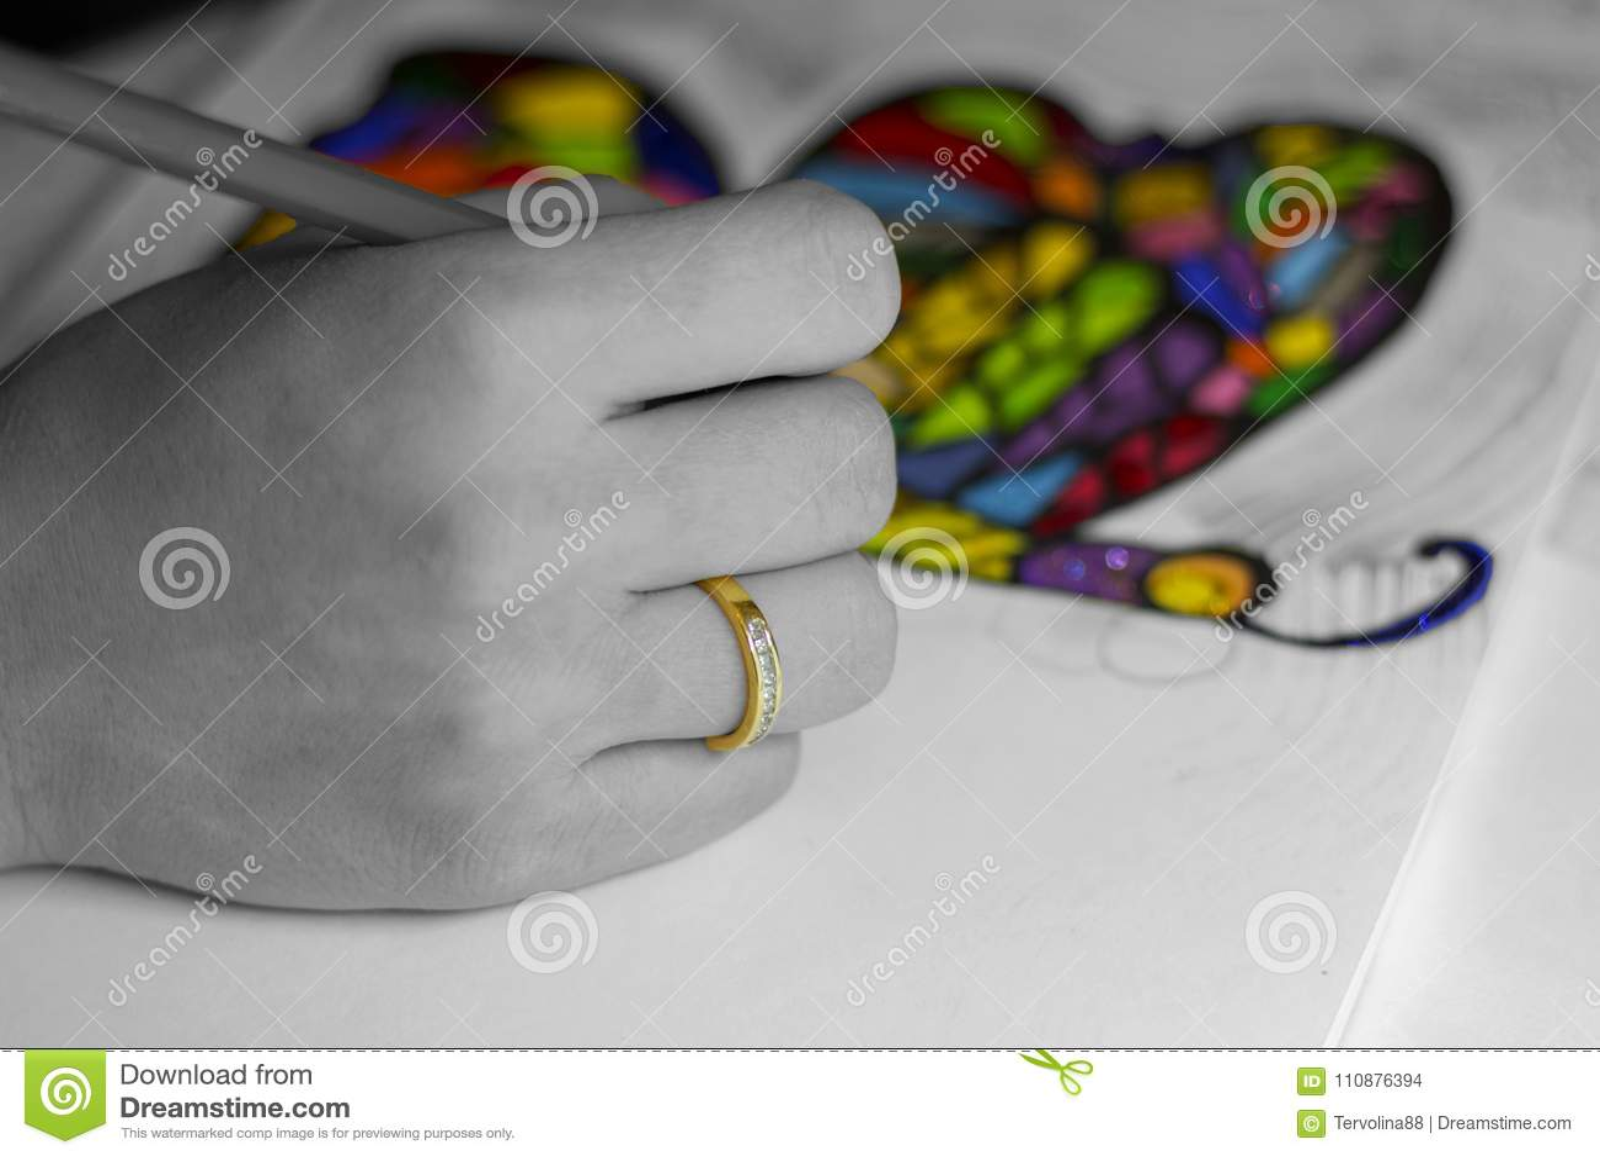 Mano que dibuja una mariposa colorida del arco iris